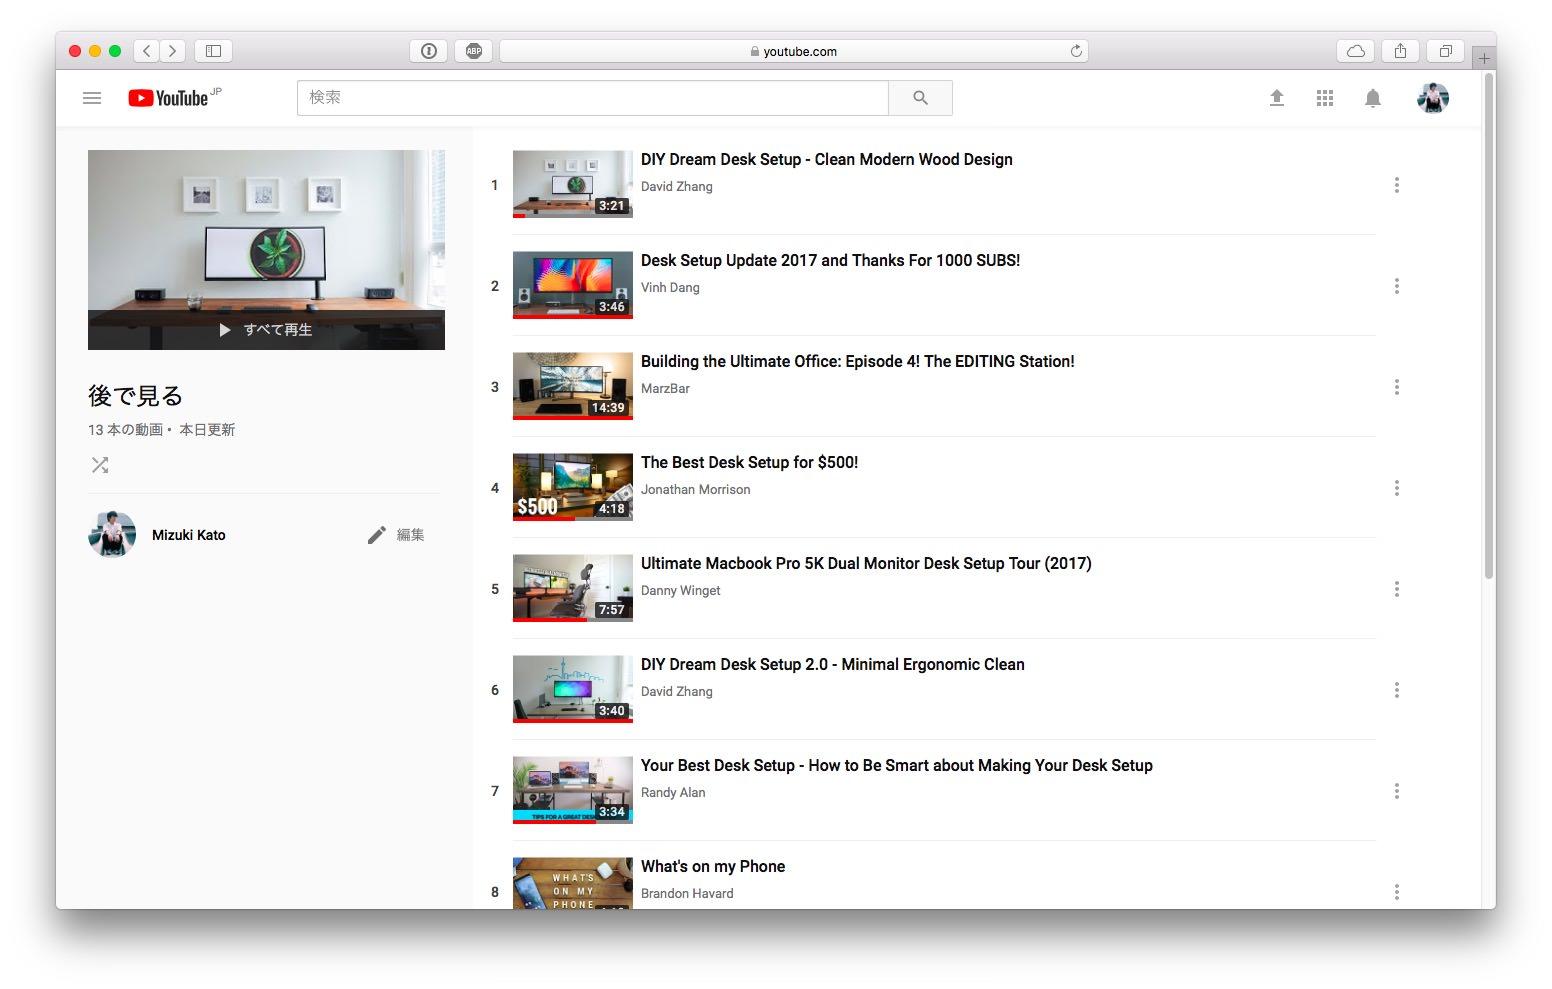 Youtubeでデスク紹介動画をまとめた